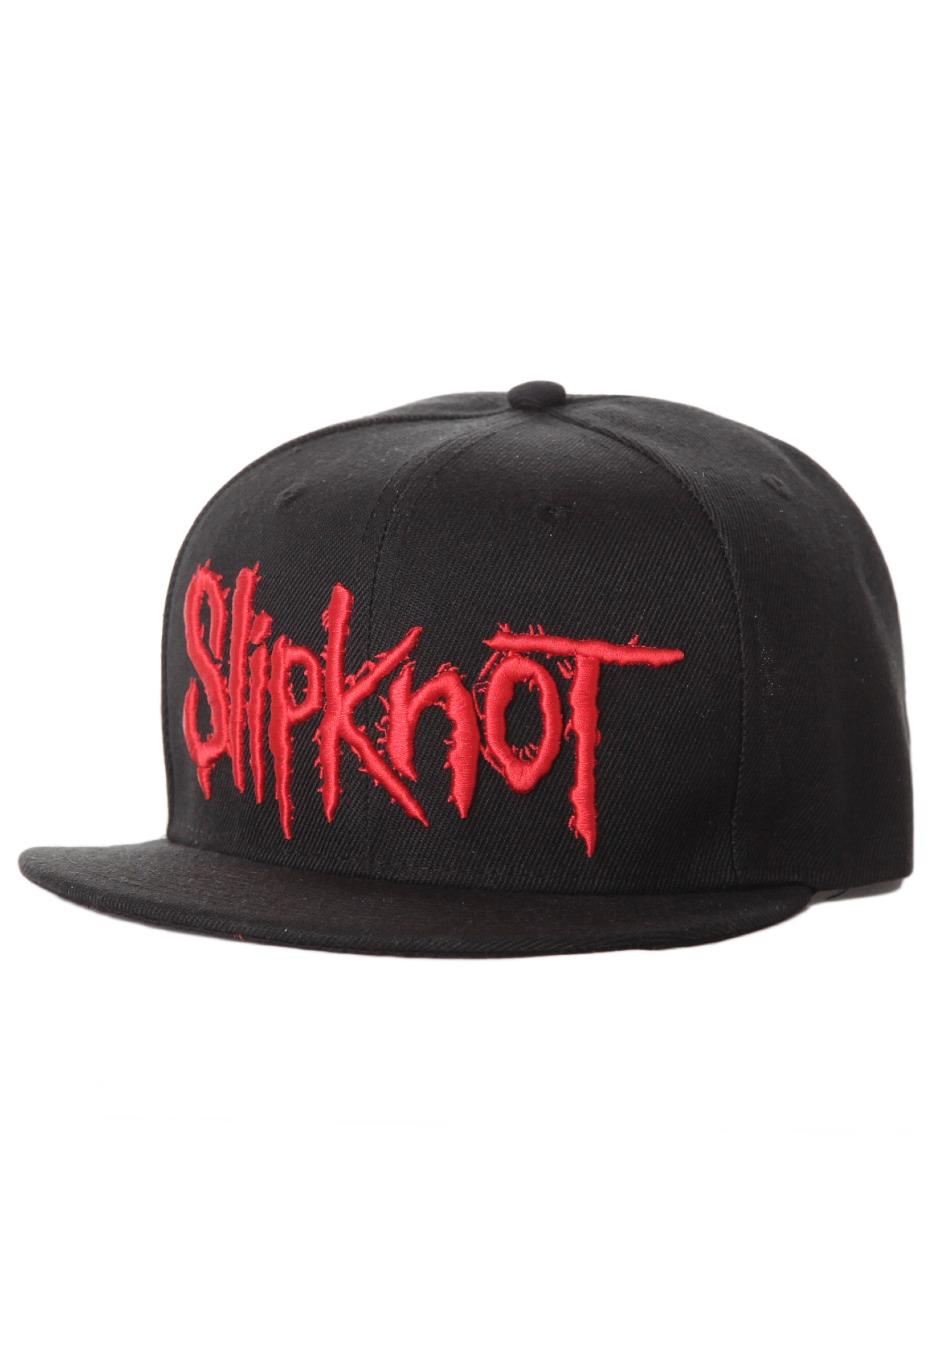 how to draw slipknot logo